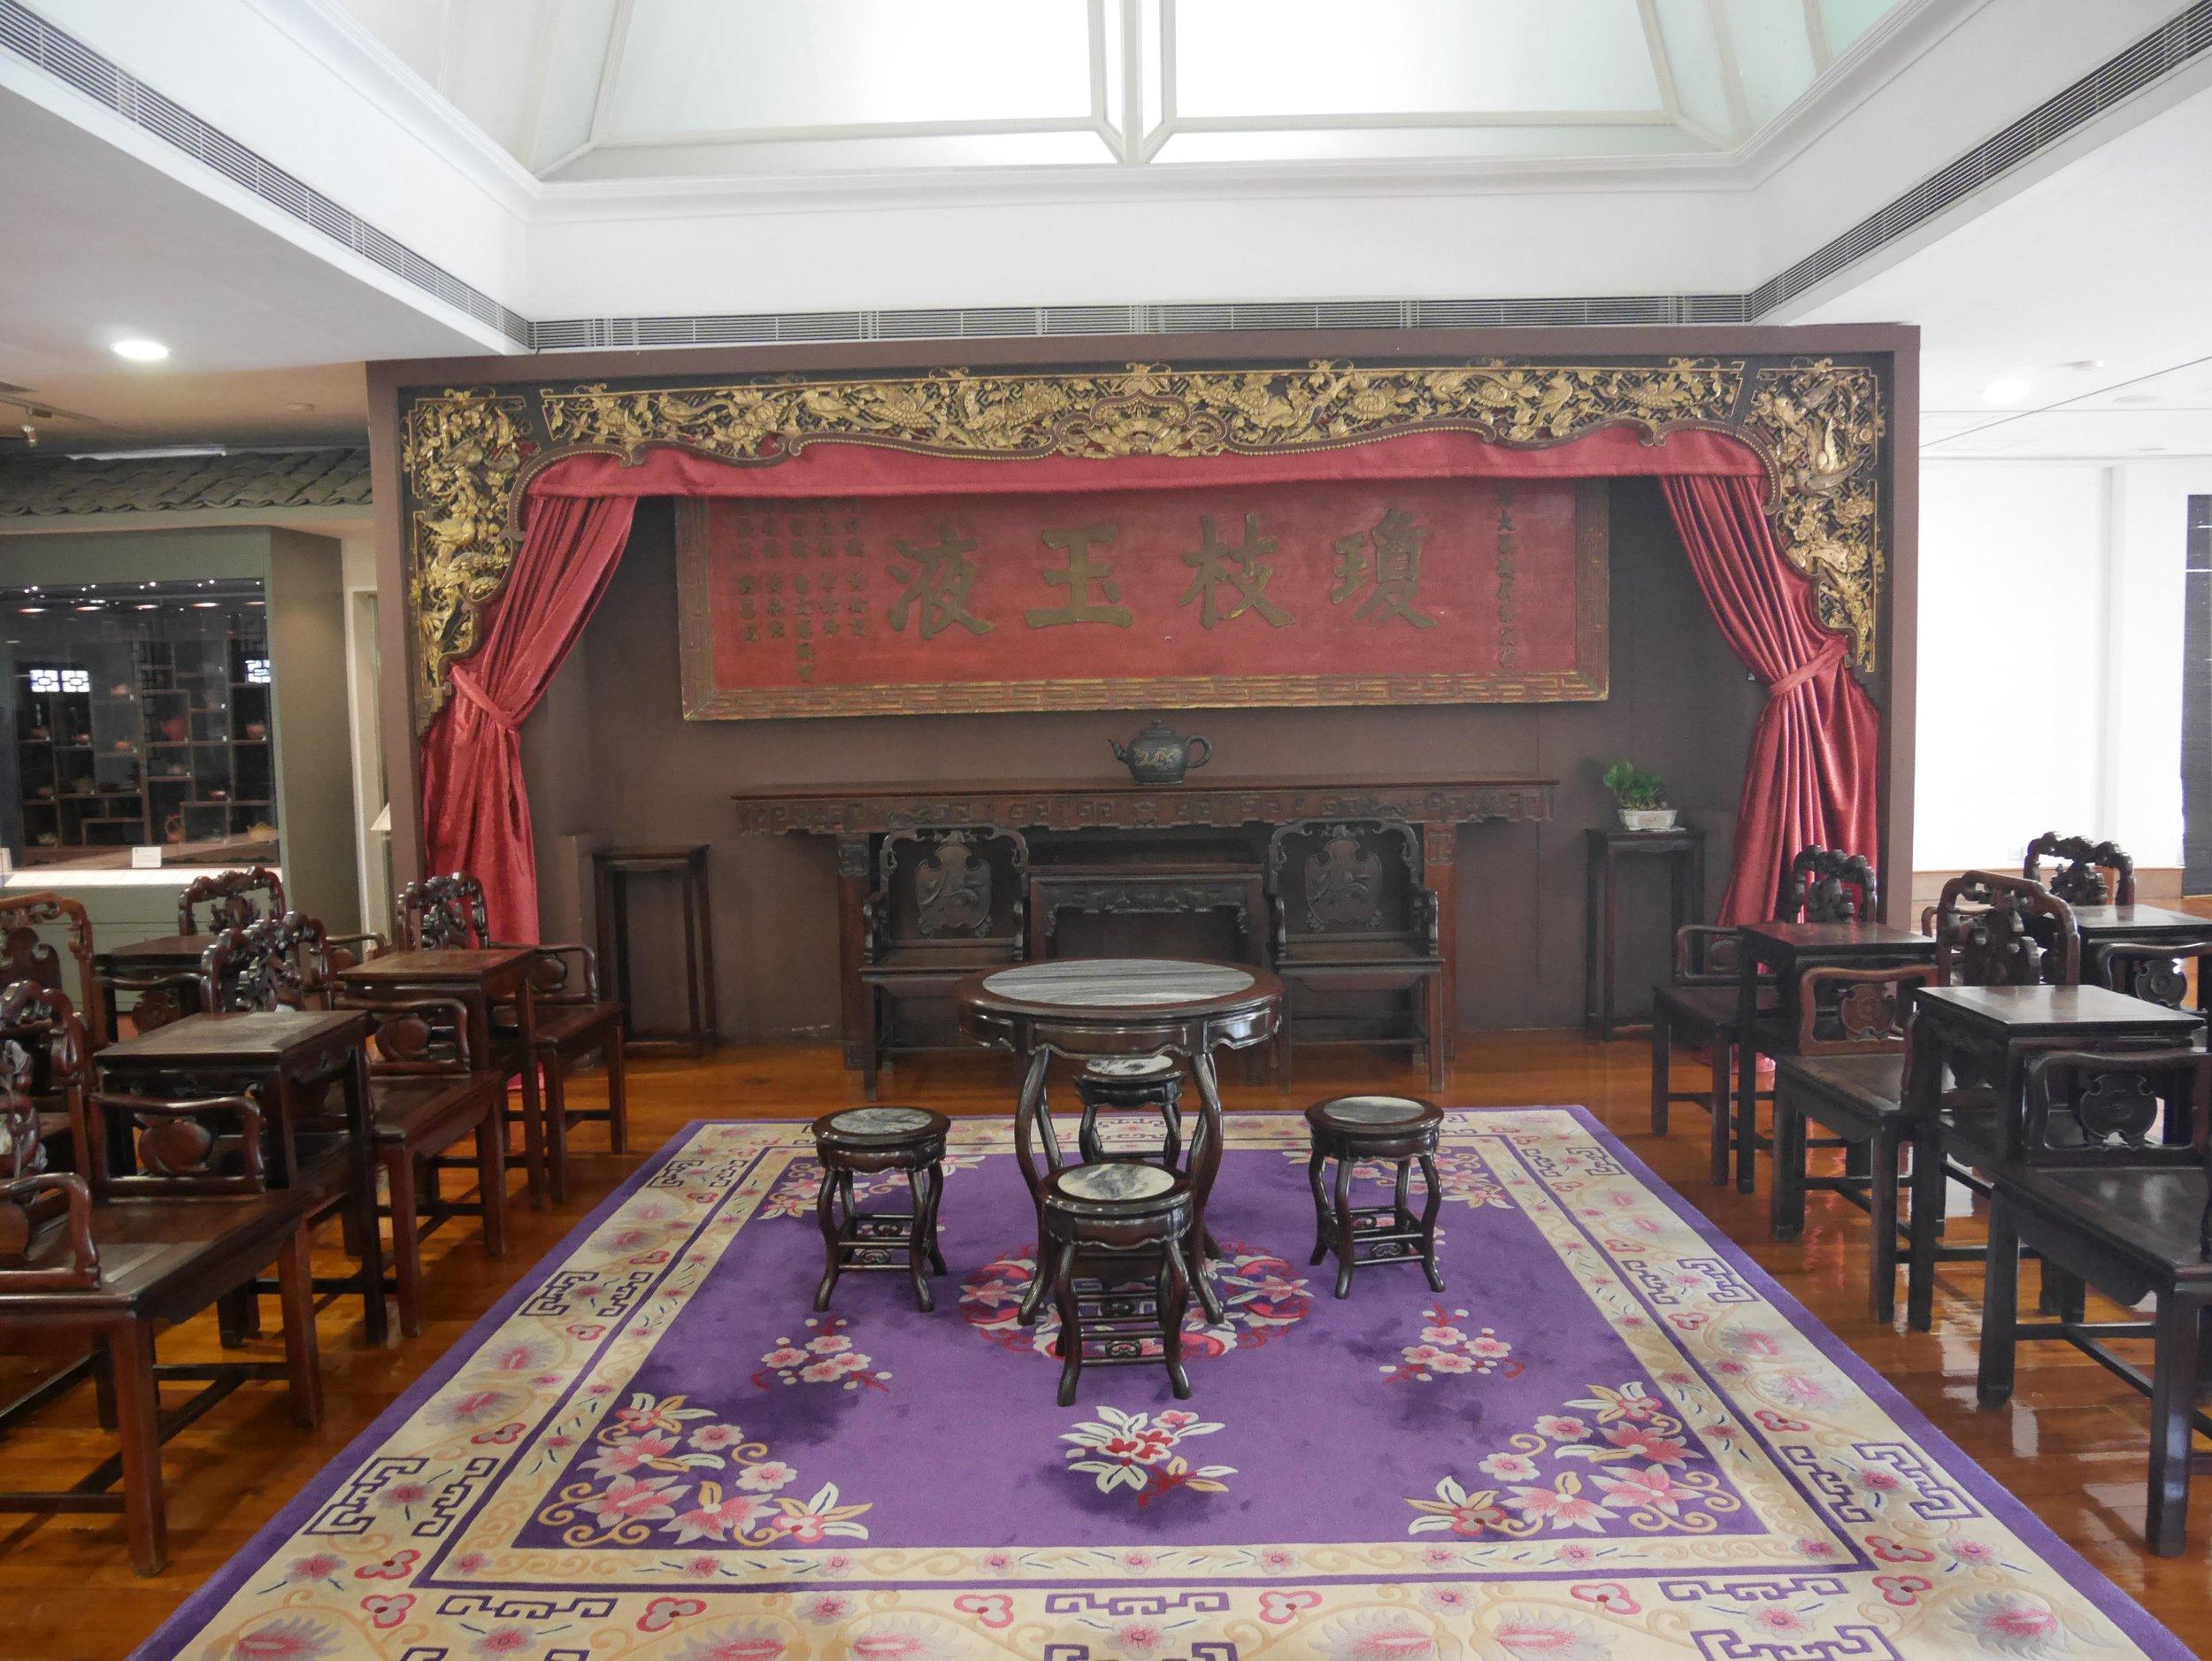 the tea room at the Macau Tea Culture House Museum